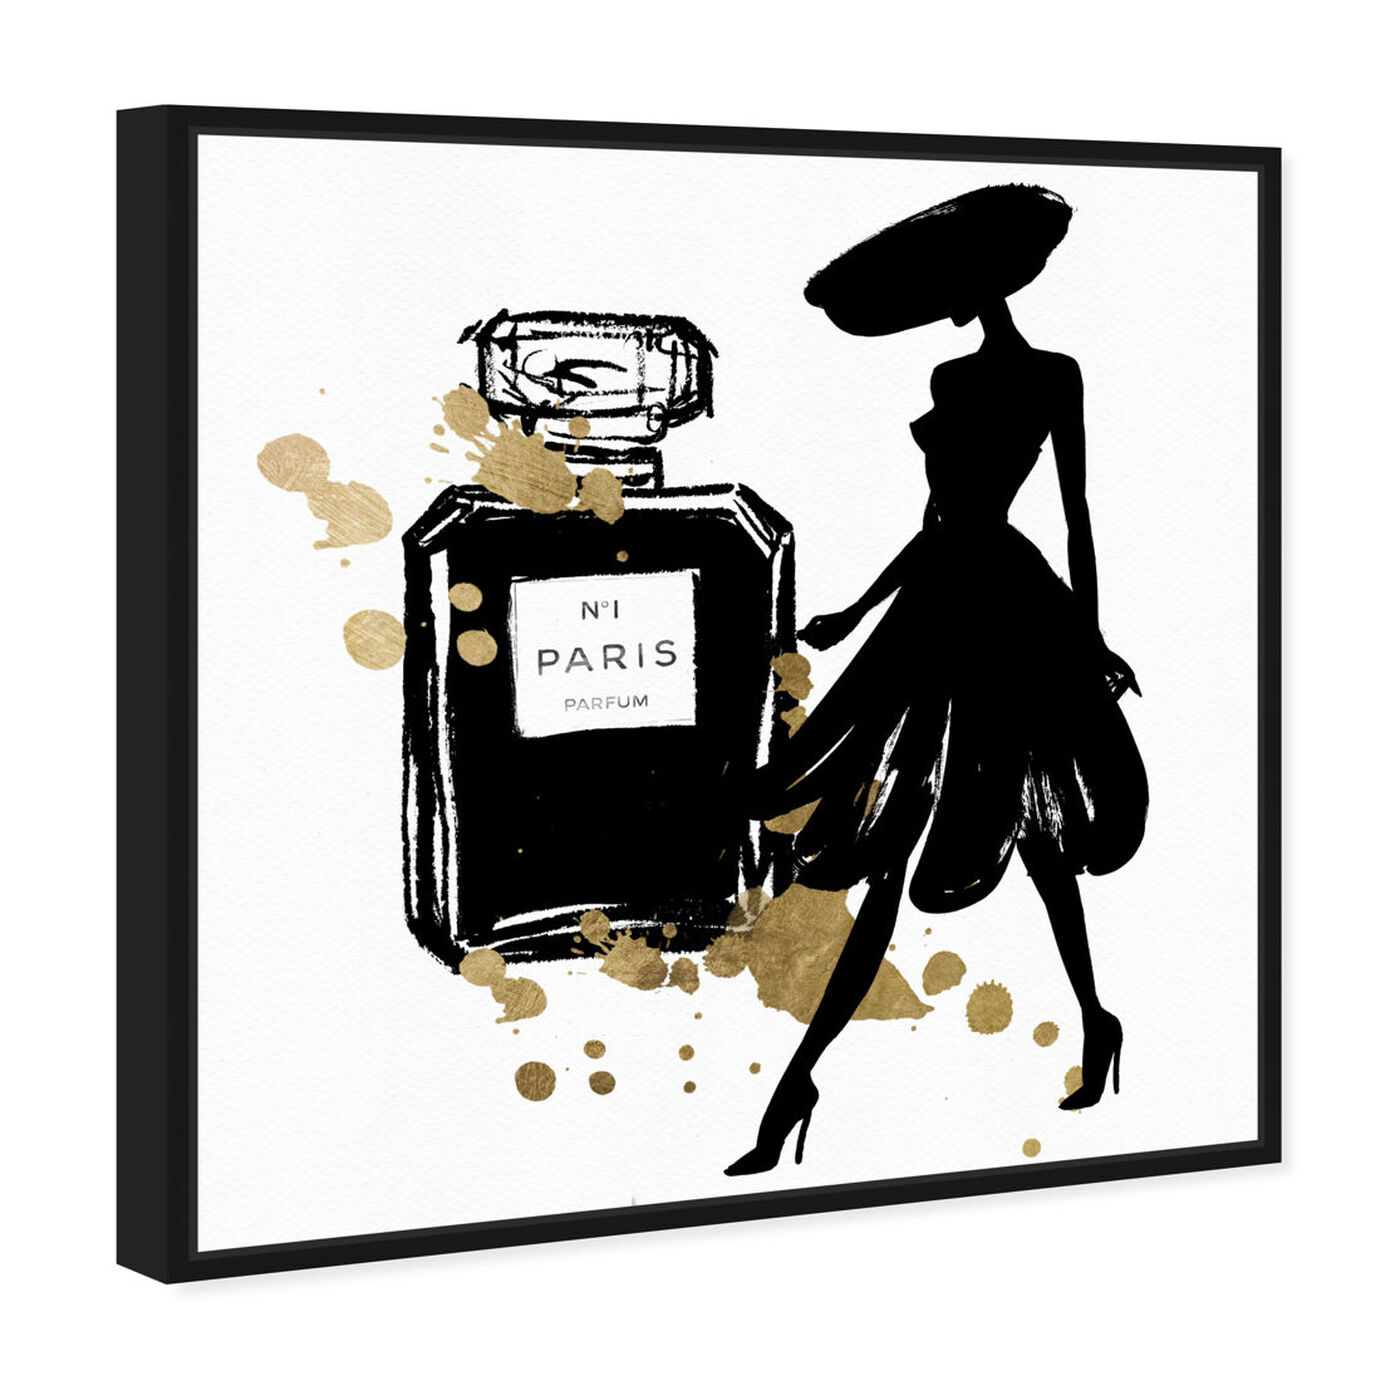 Angled view of Mas Pasarela Paris featuring fashion and glam and perfumes art.